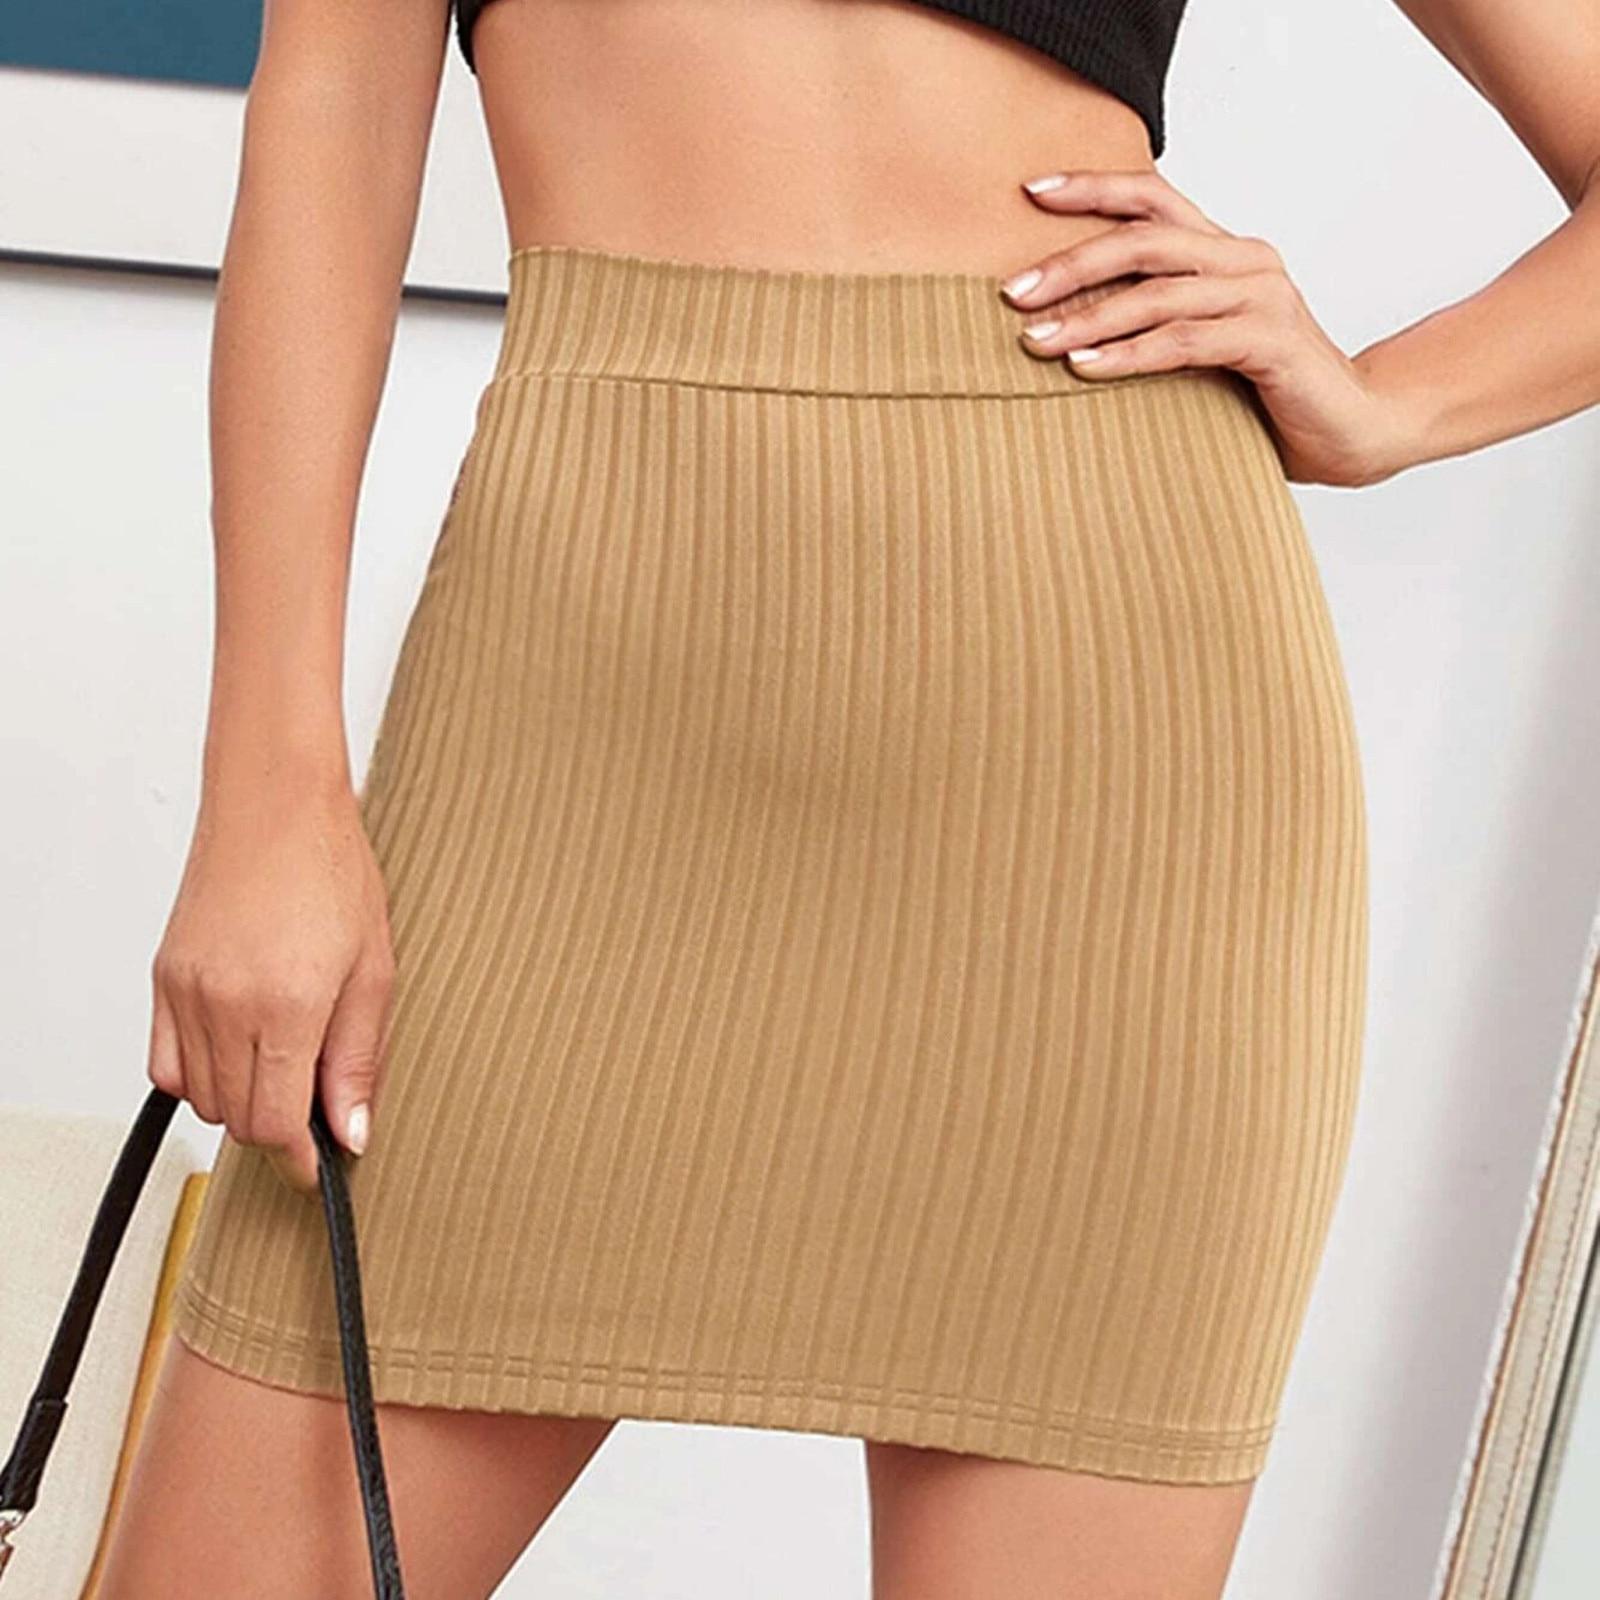 Фото - Юбка-трапеция Женская выше колена, модная однотонная мини-юбка, Повседневная модная трапециевидная мини-юбка, на лето flavio castellani мини юбка